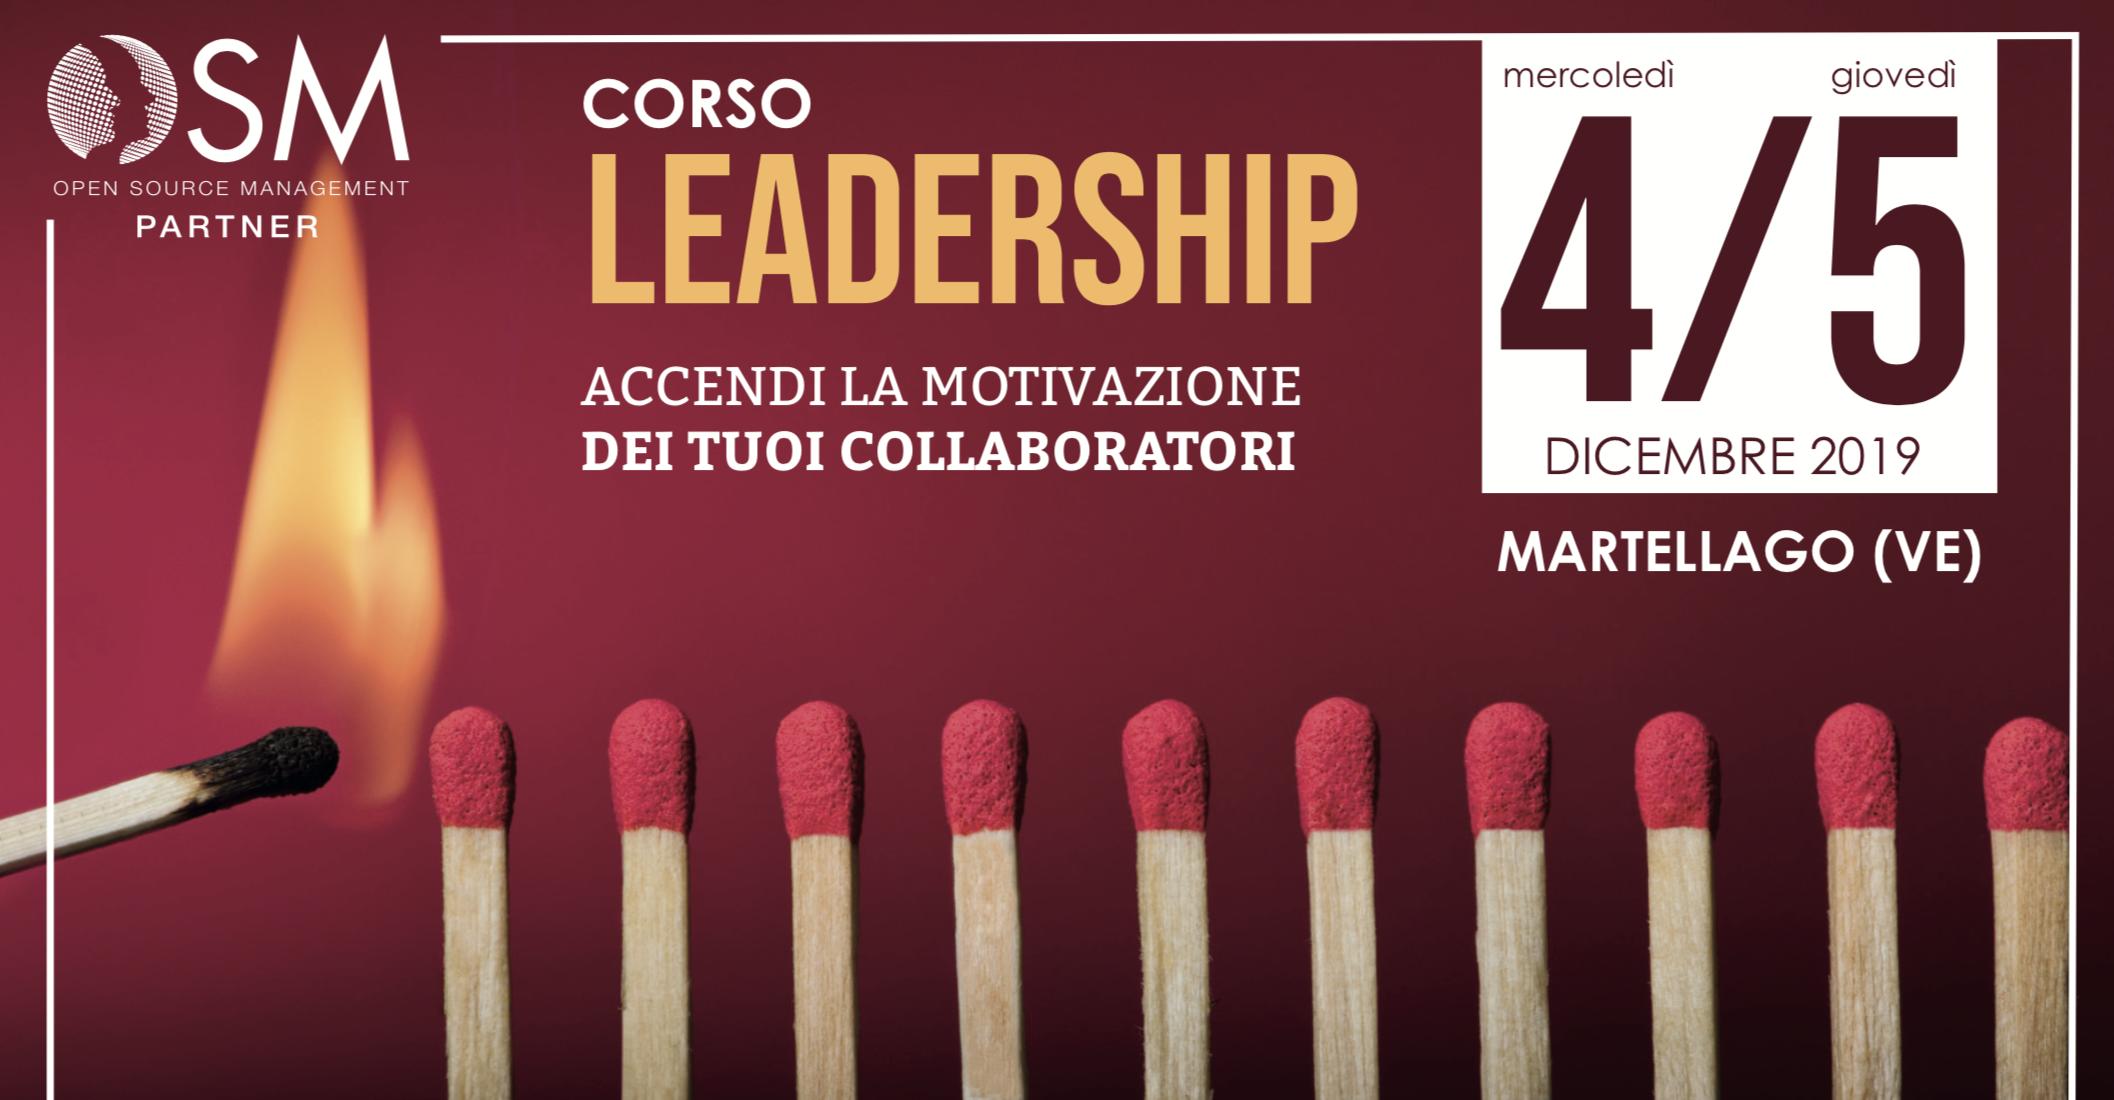 Corso Leadership Base - Martellago, 4 e 5 Dicembre 2019